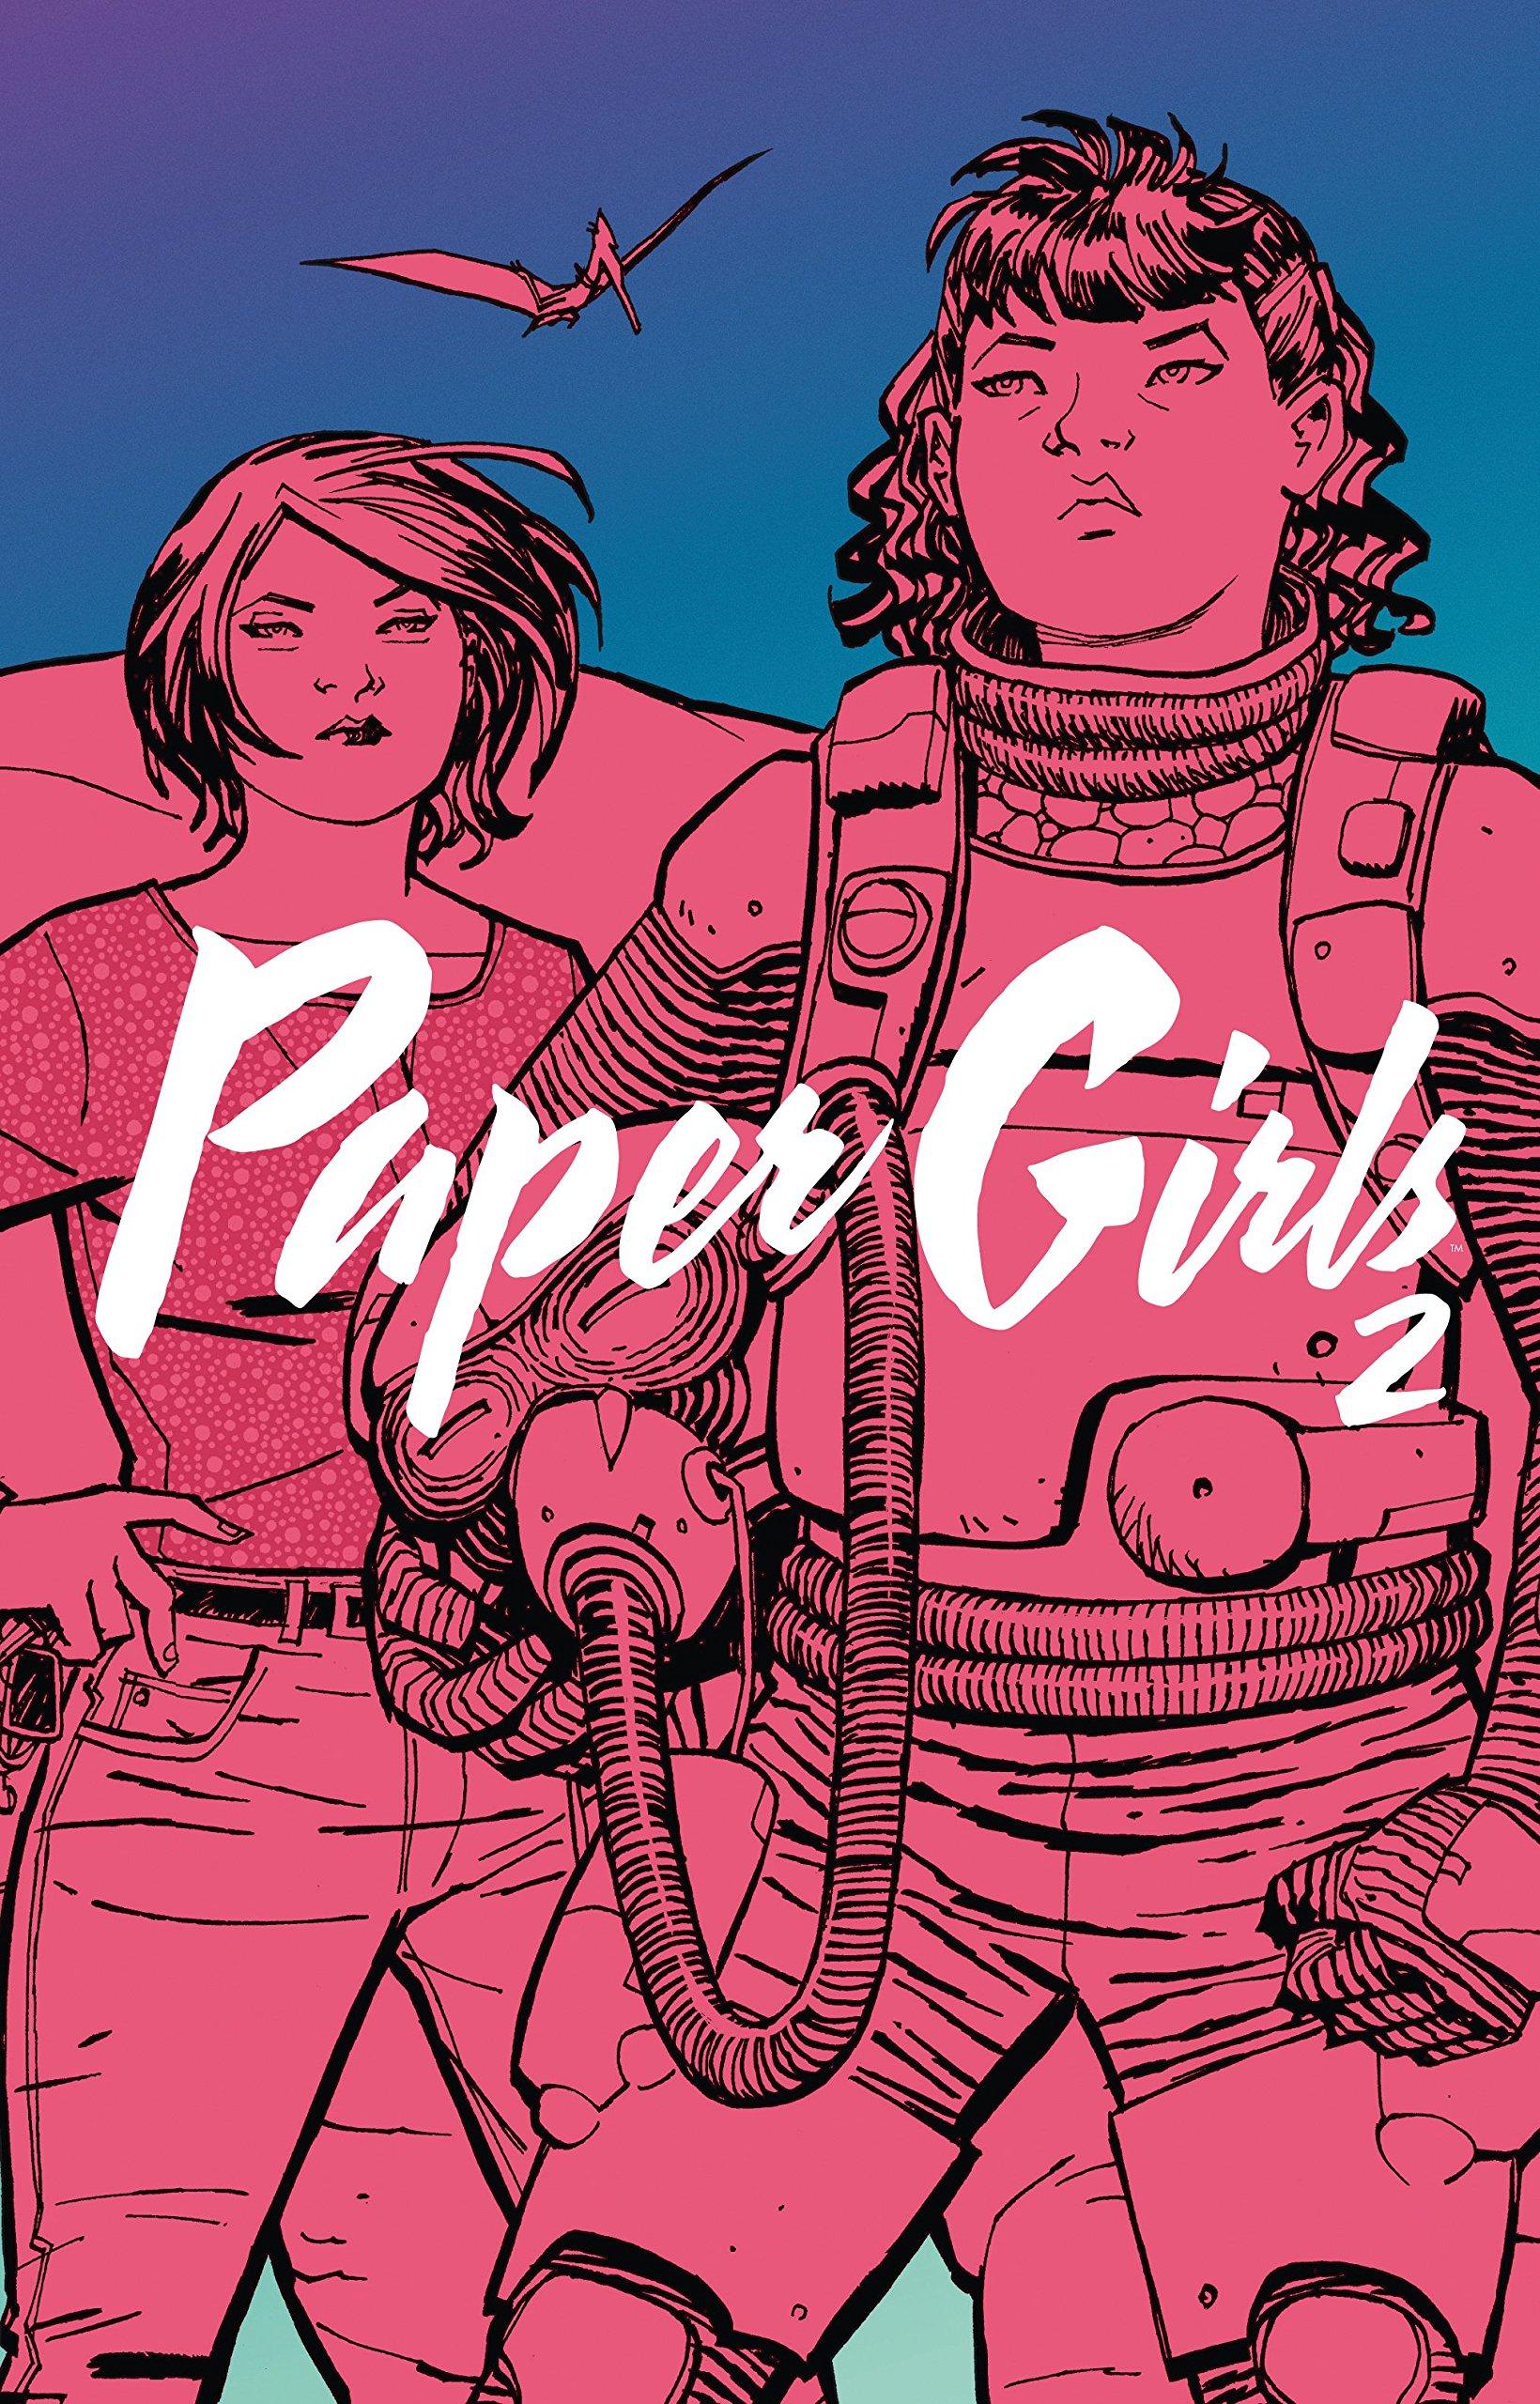 Paper Girls (Tomo) nº 02 (Independientes USA) Tapa dura – 6 sep 2018 Brian K.%Vaughan Cliff Chiang Diego de los Santos Planeta DeAgostini Cómics